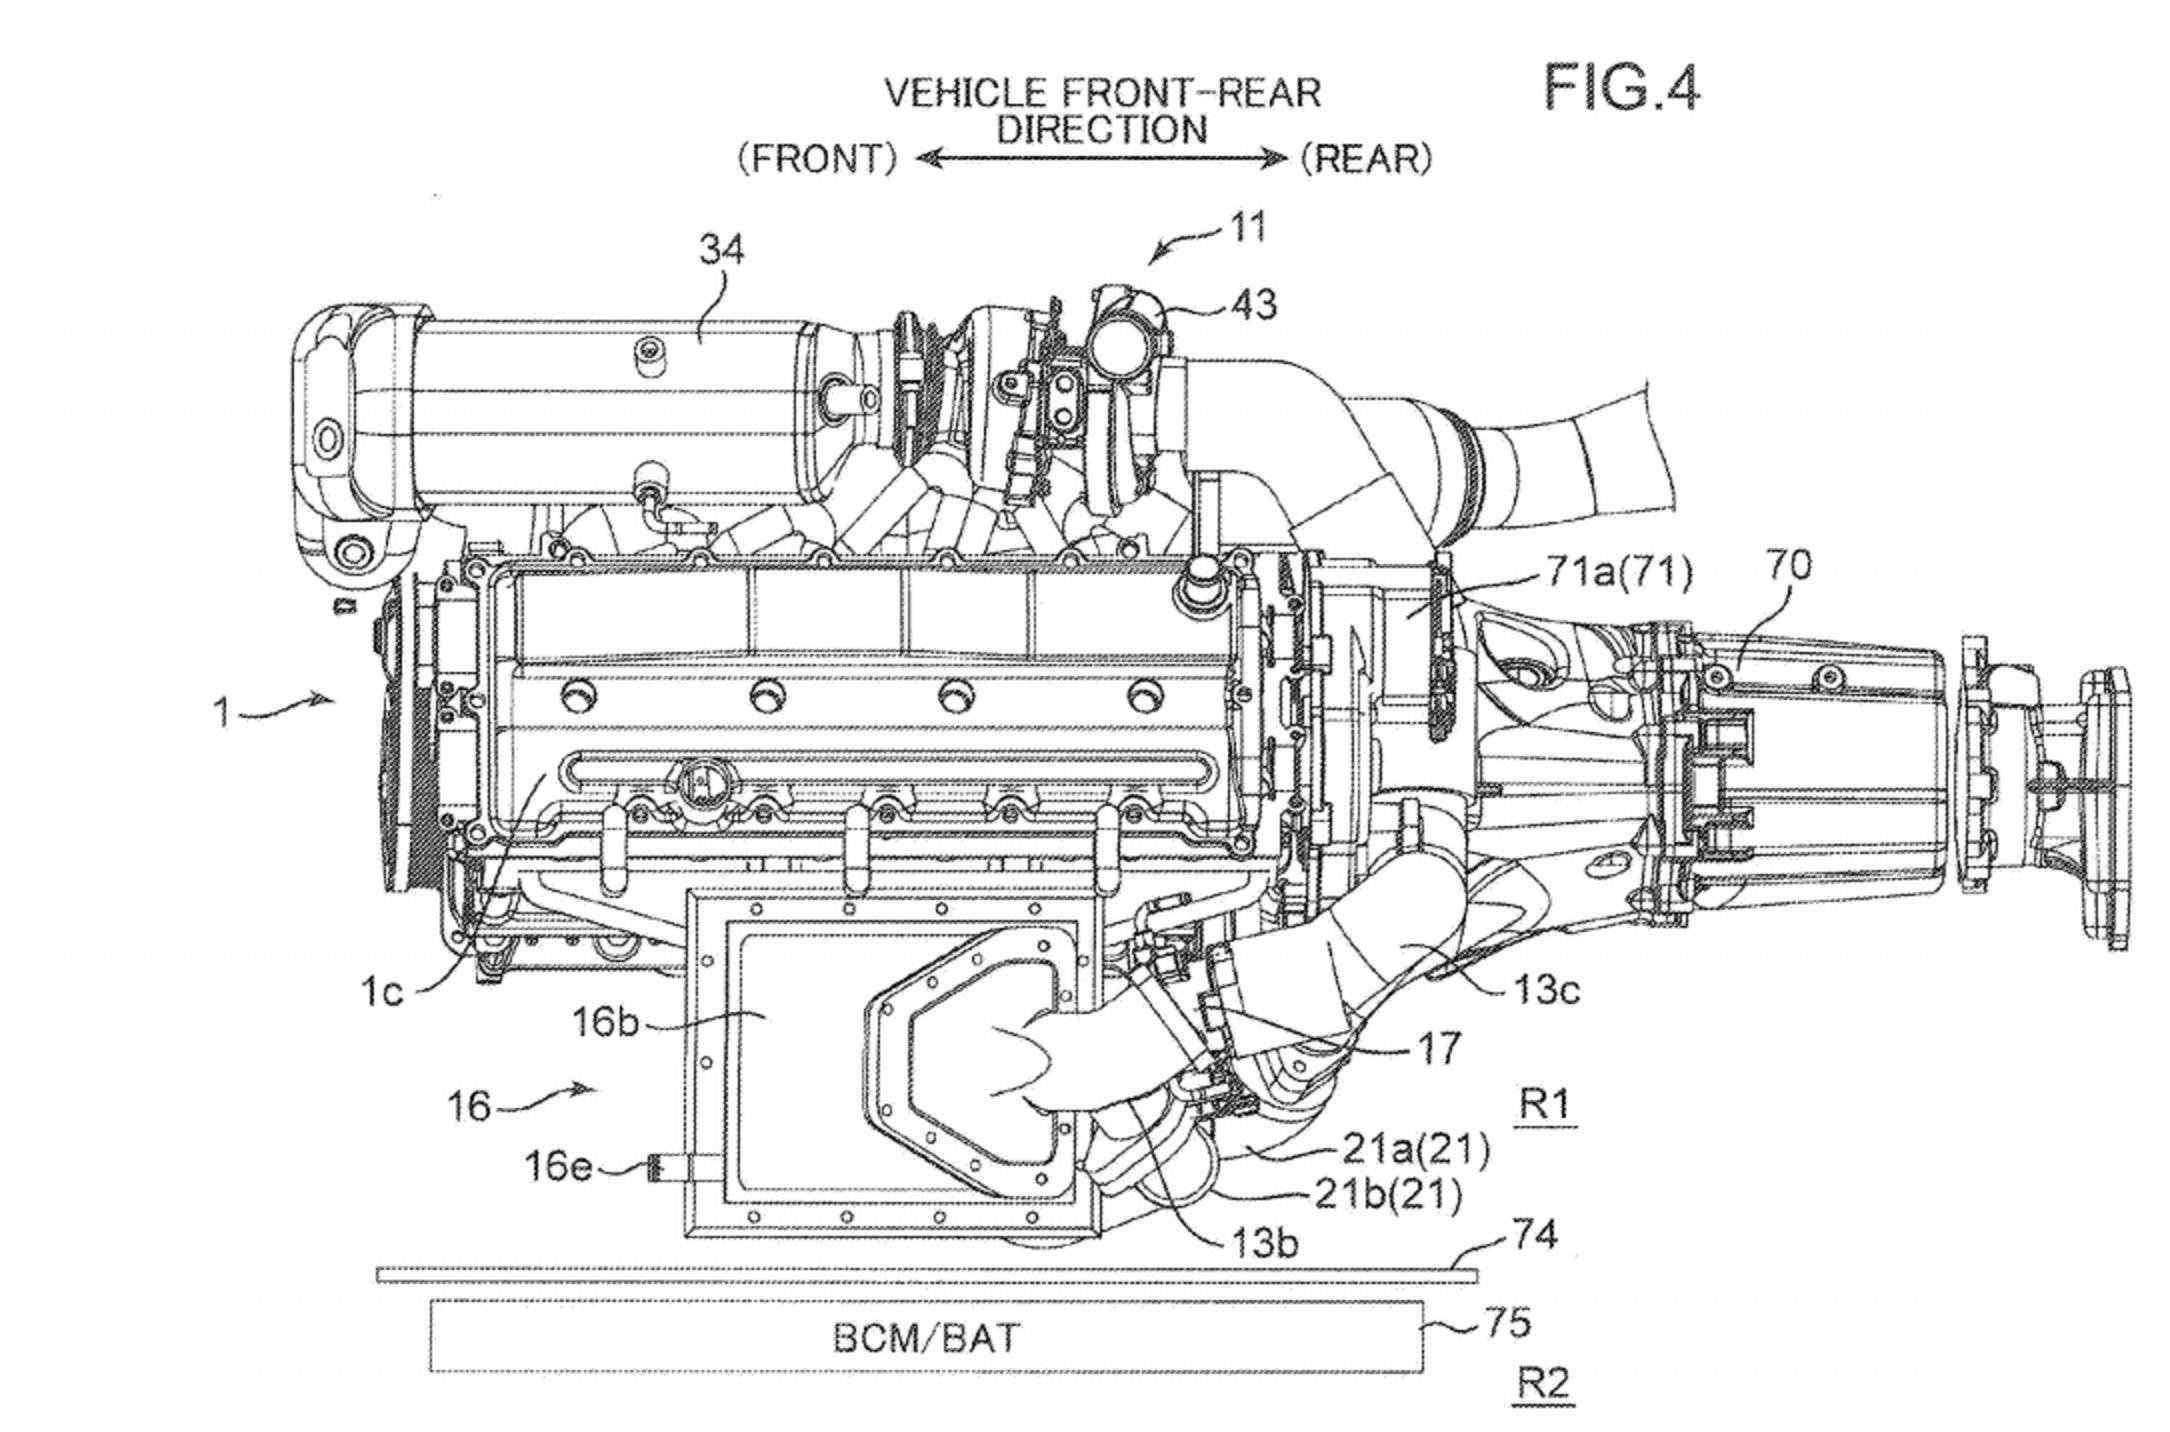 Diagram Of Rotary Engine Mazda Skyactiv X Engine Nissan Sell Battery Unit Autoline Daily Of Diagram Of Rotary Engine